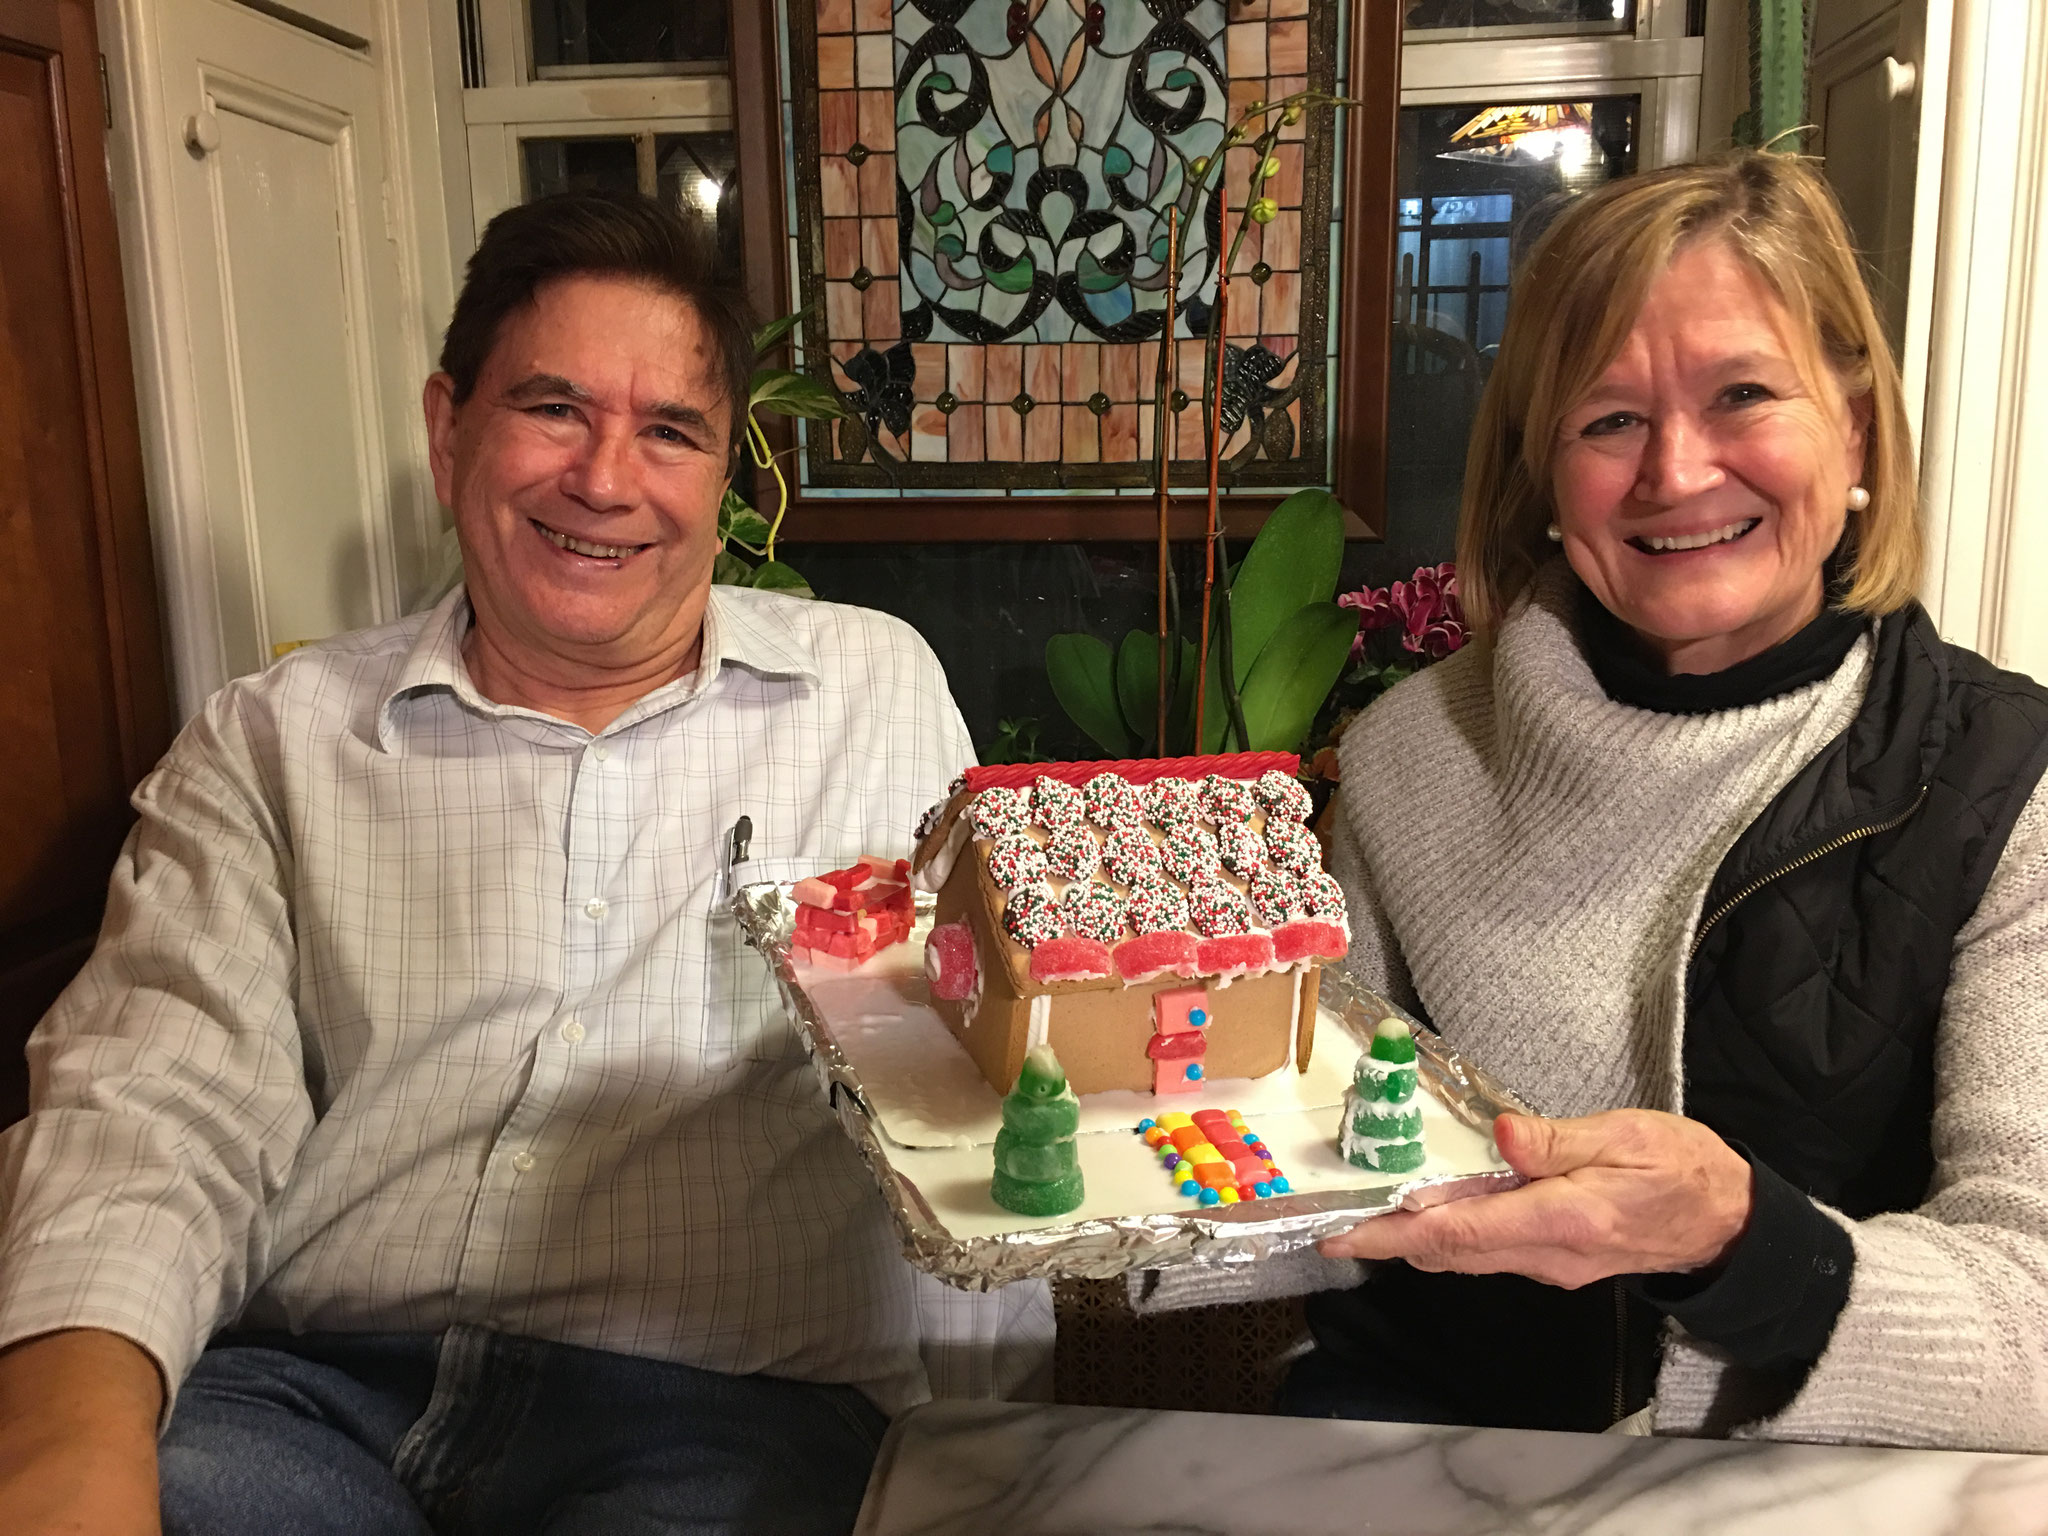 John & Sally's Gingerbread house!